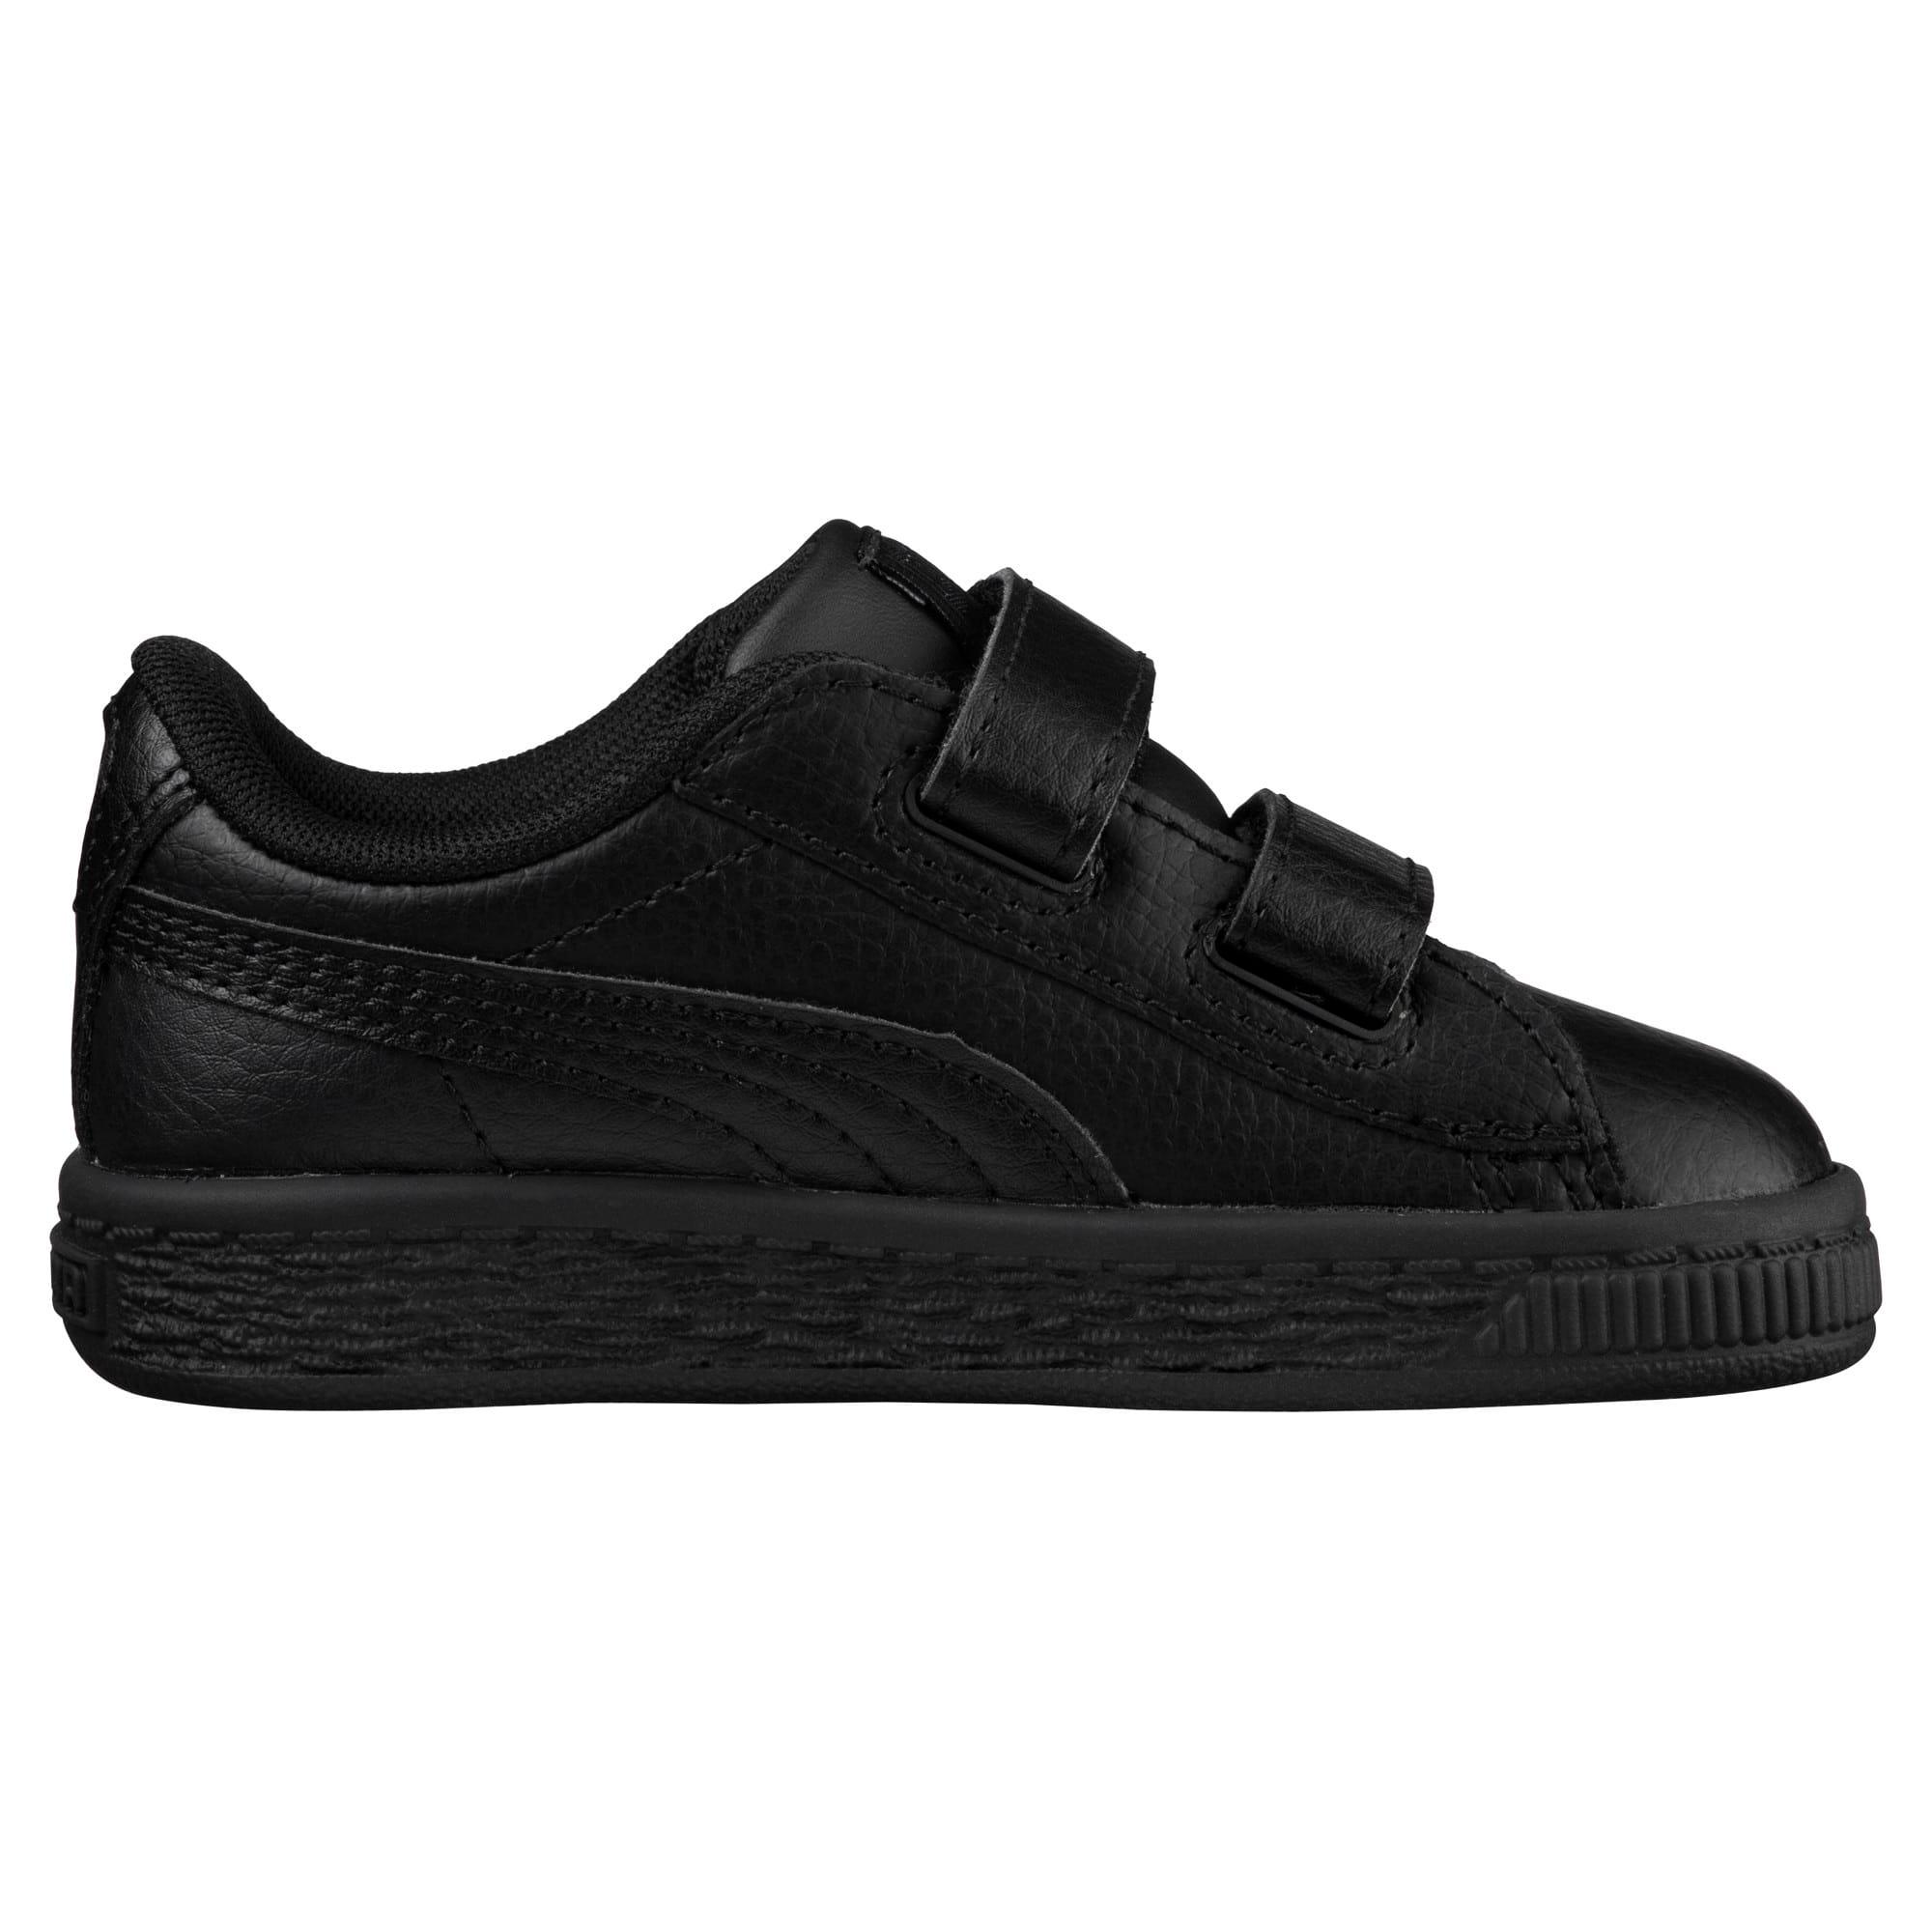 Thumbnail 3 of Basket Classic AC Toddler Shoes, Puma Black-Puma Black, medium